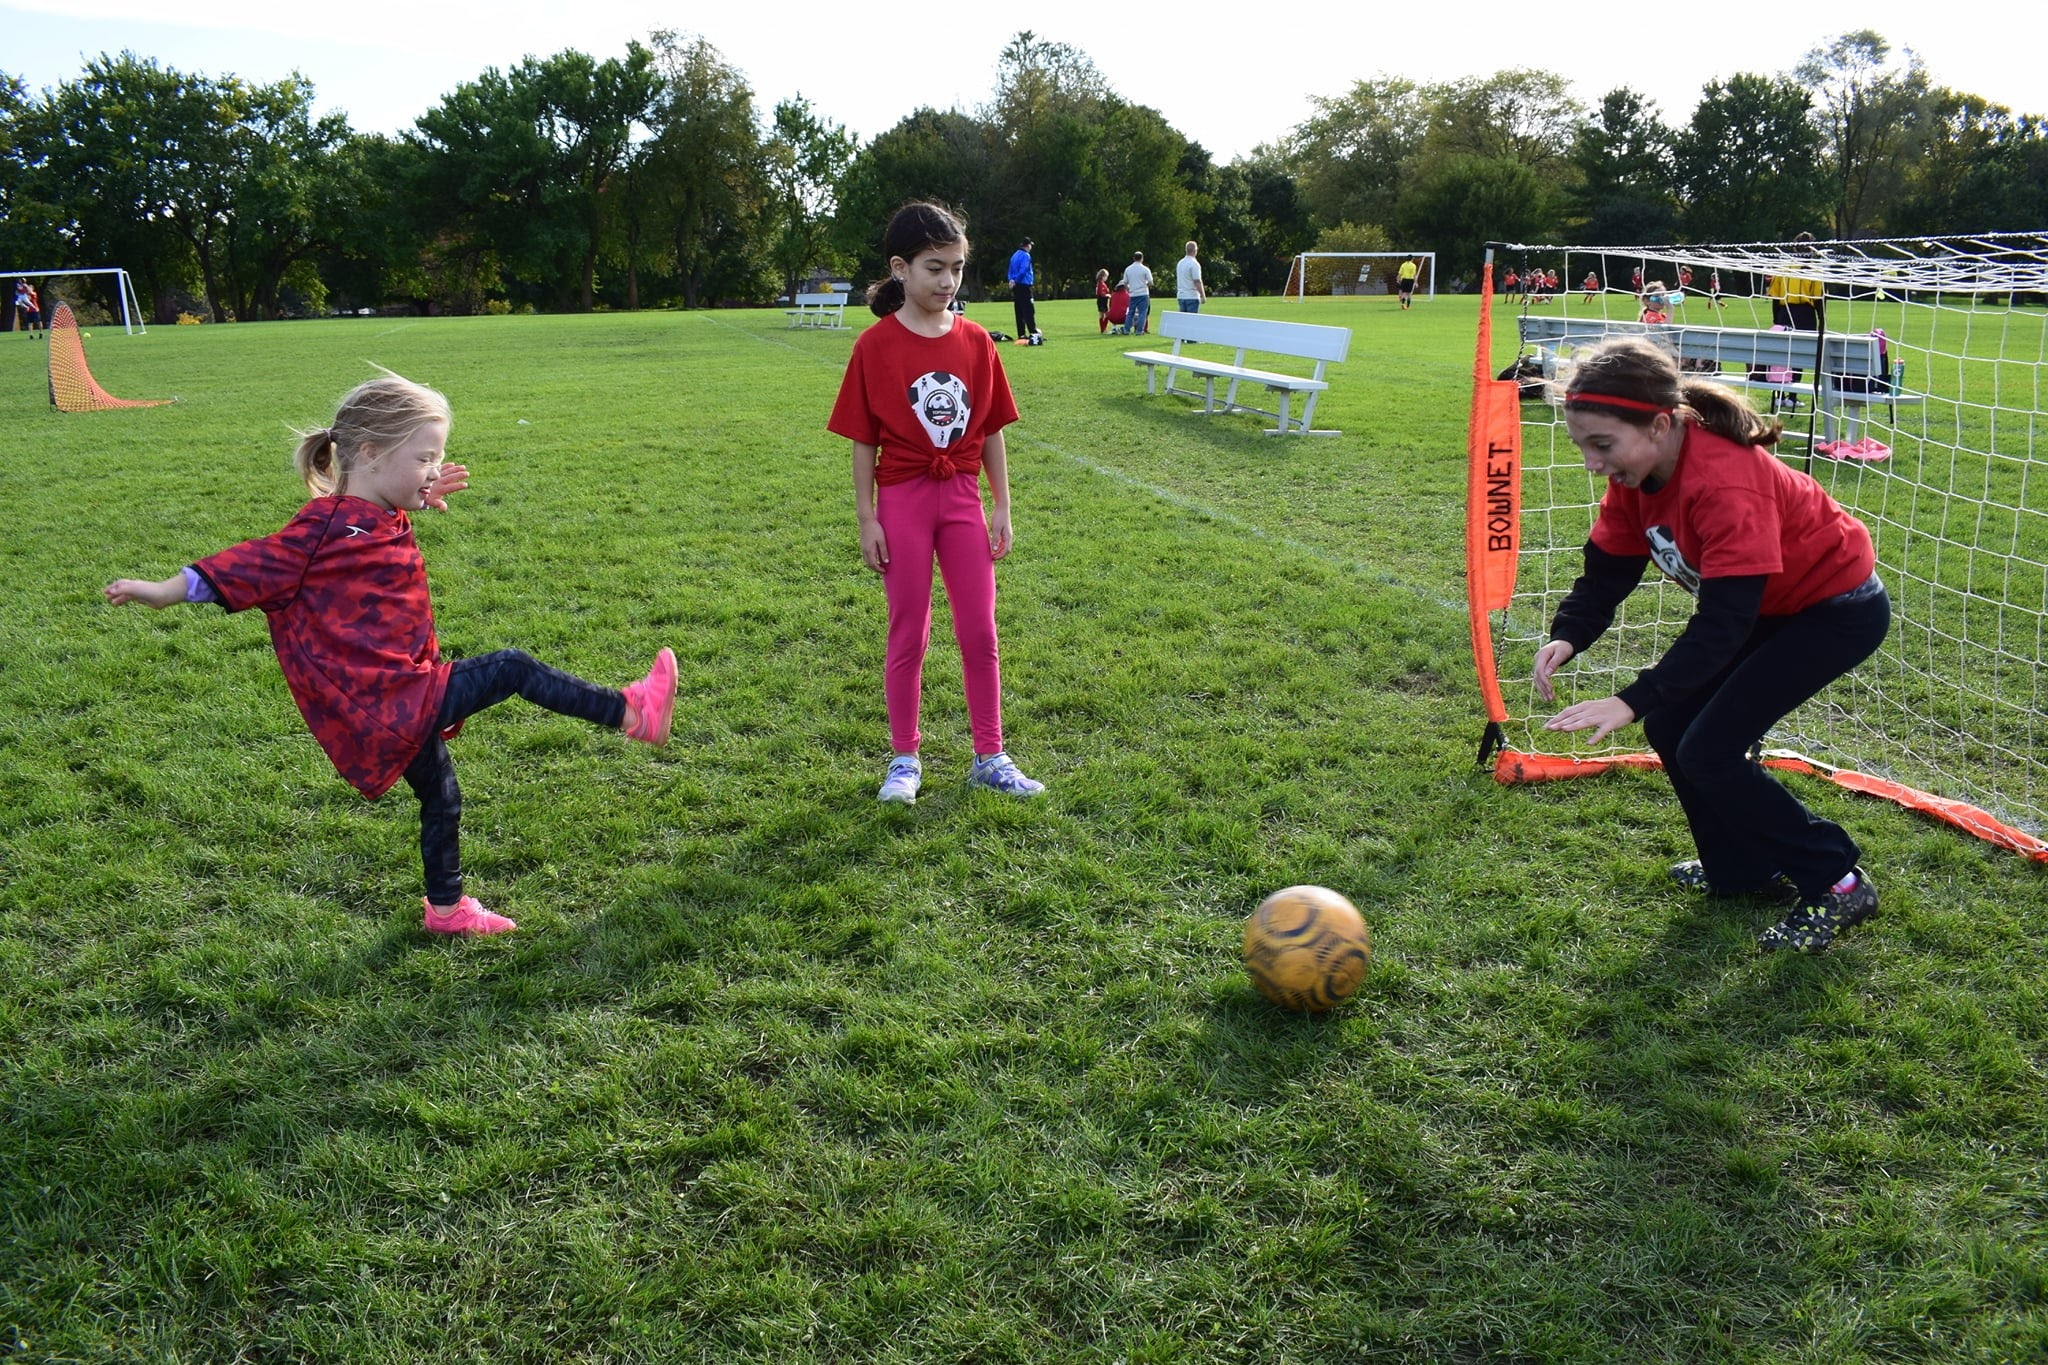 Options for Summer Family Fun - SAA TOPSoccer-Schaumburg